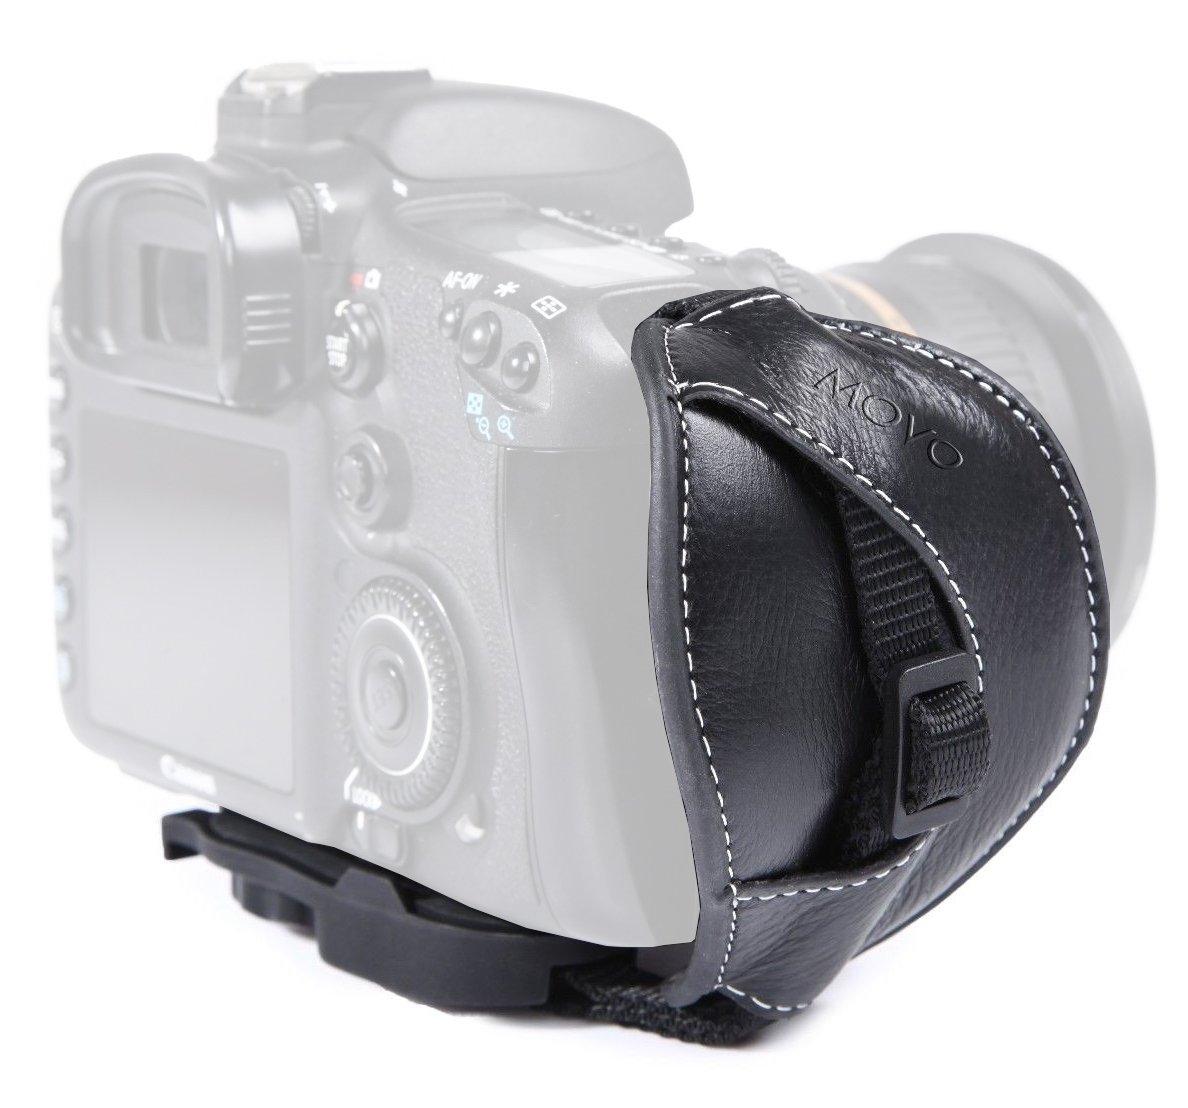 Movo Photo HSG-6 Premium Alternative Leather Padded Secure Grip Strap for Canon EOS, Nikon, Sony, Olympus, Pentax & Panasonic DSLR & Mirrorless Cameras